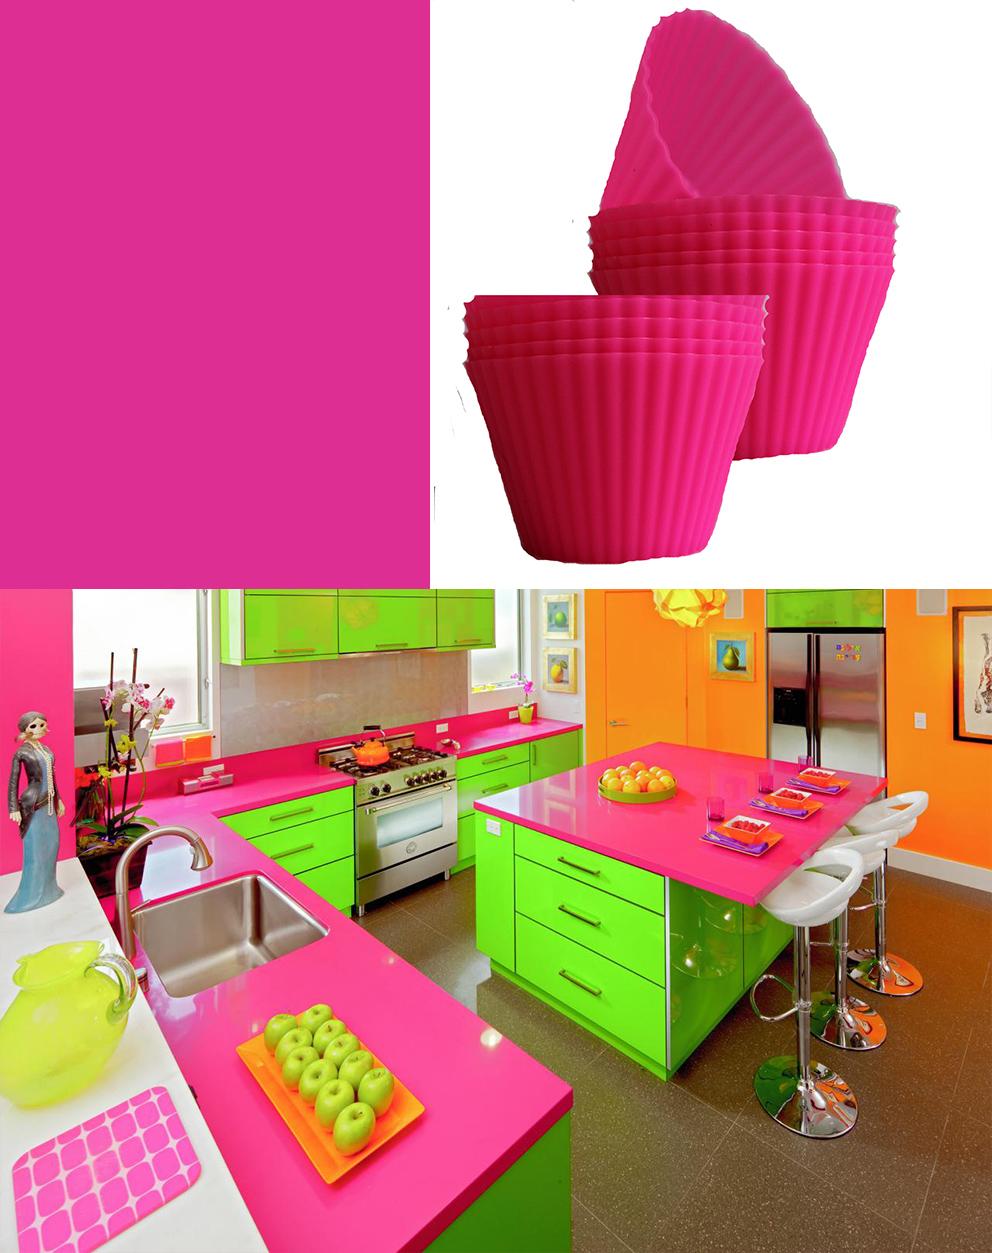 BG-POW-cupcake-cups-Hot-Pink-Kitchen.jpg